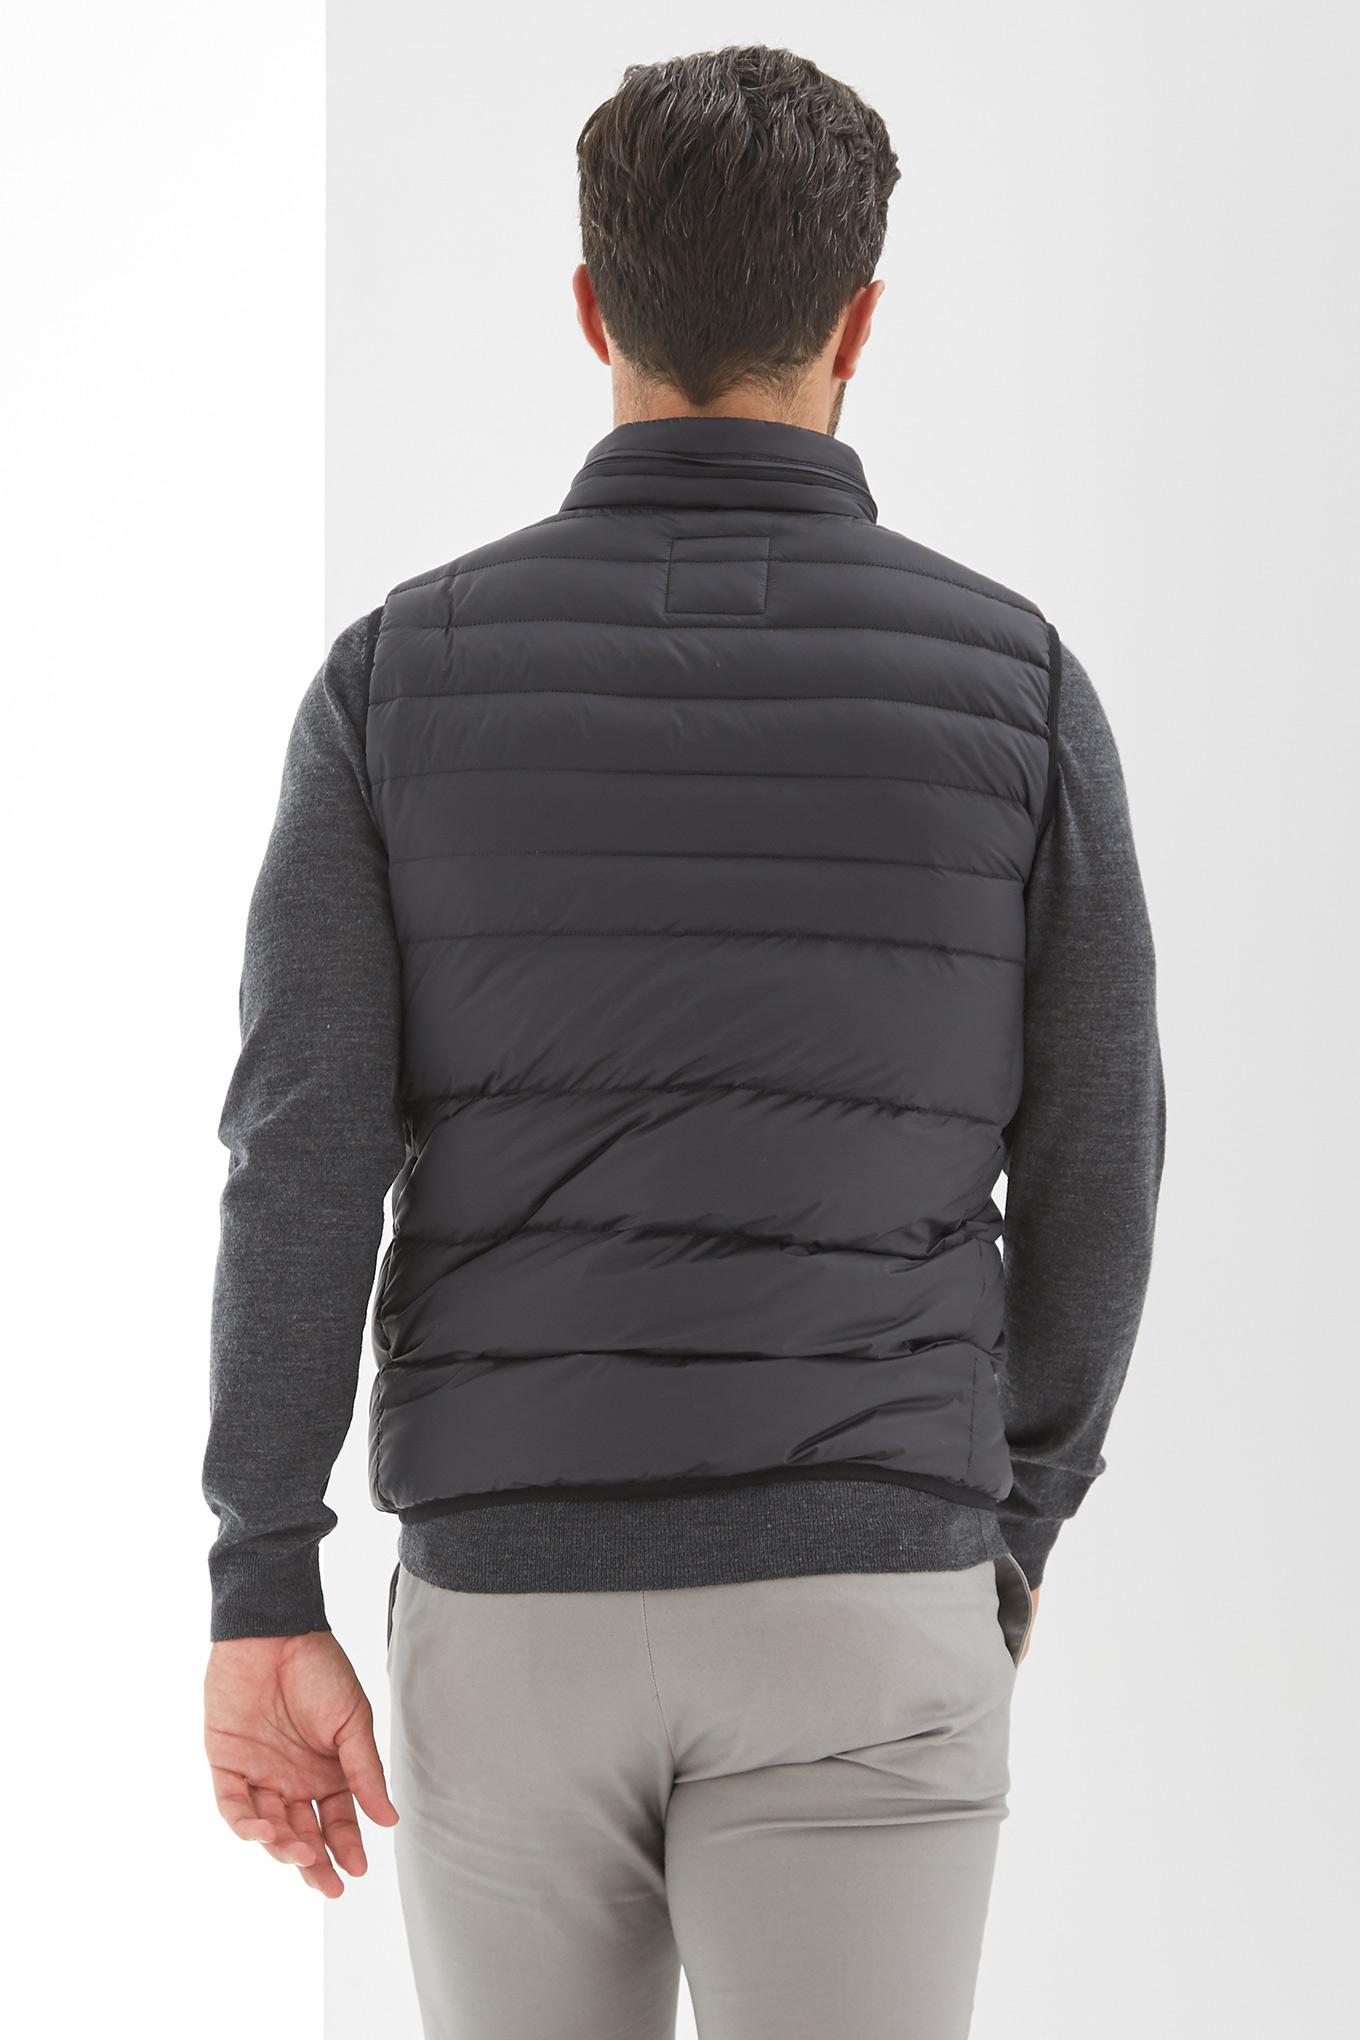 Waist Coat Black Casual Man